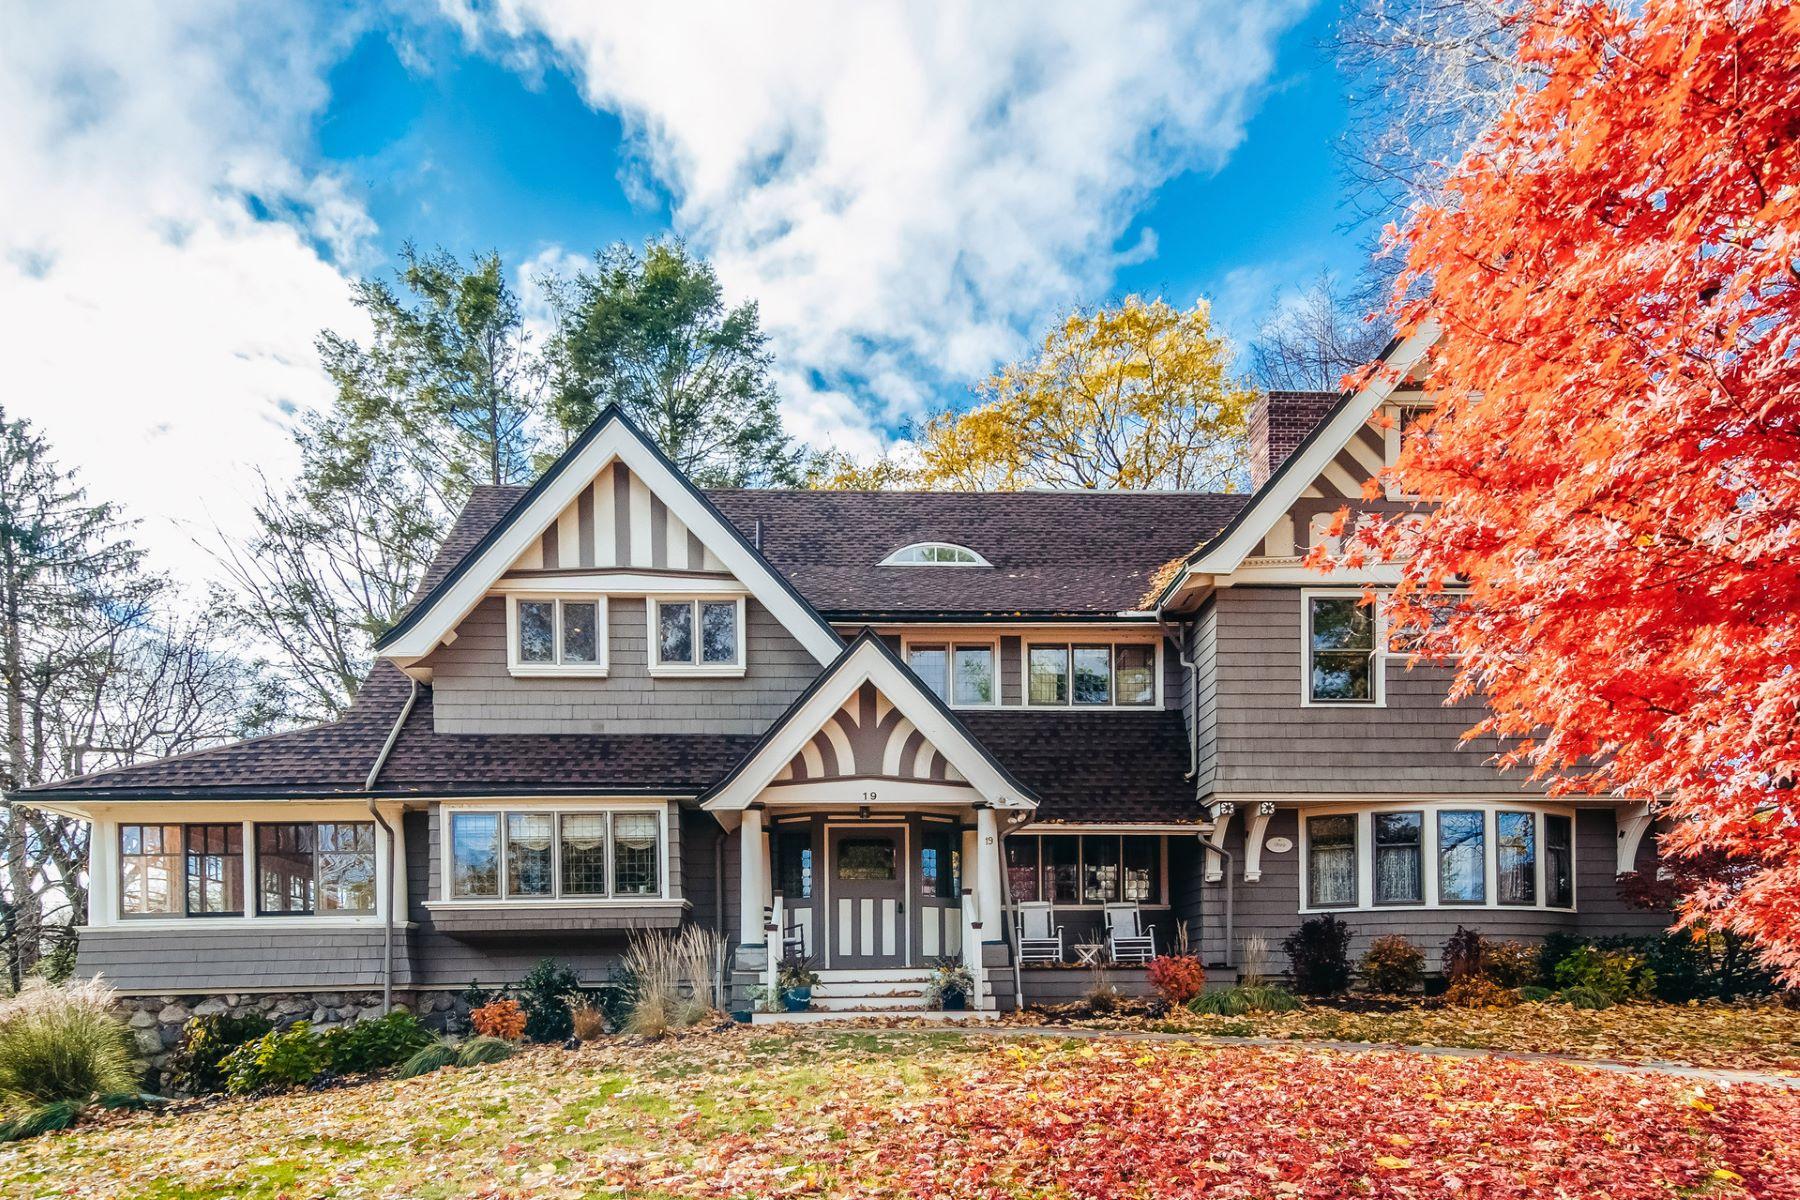 Casa Unifamiliar por un Venta en 19 Burnham Road, Newton 19 Burnham Rd Newton, Massachusetts 02465 Estados Unidos